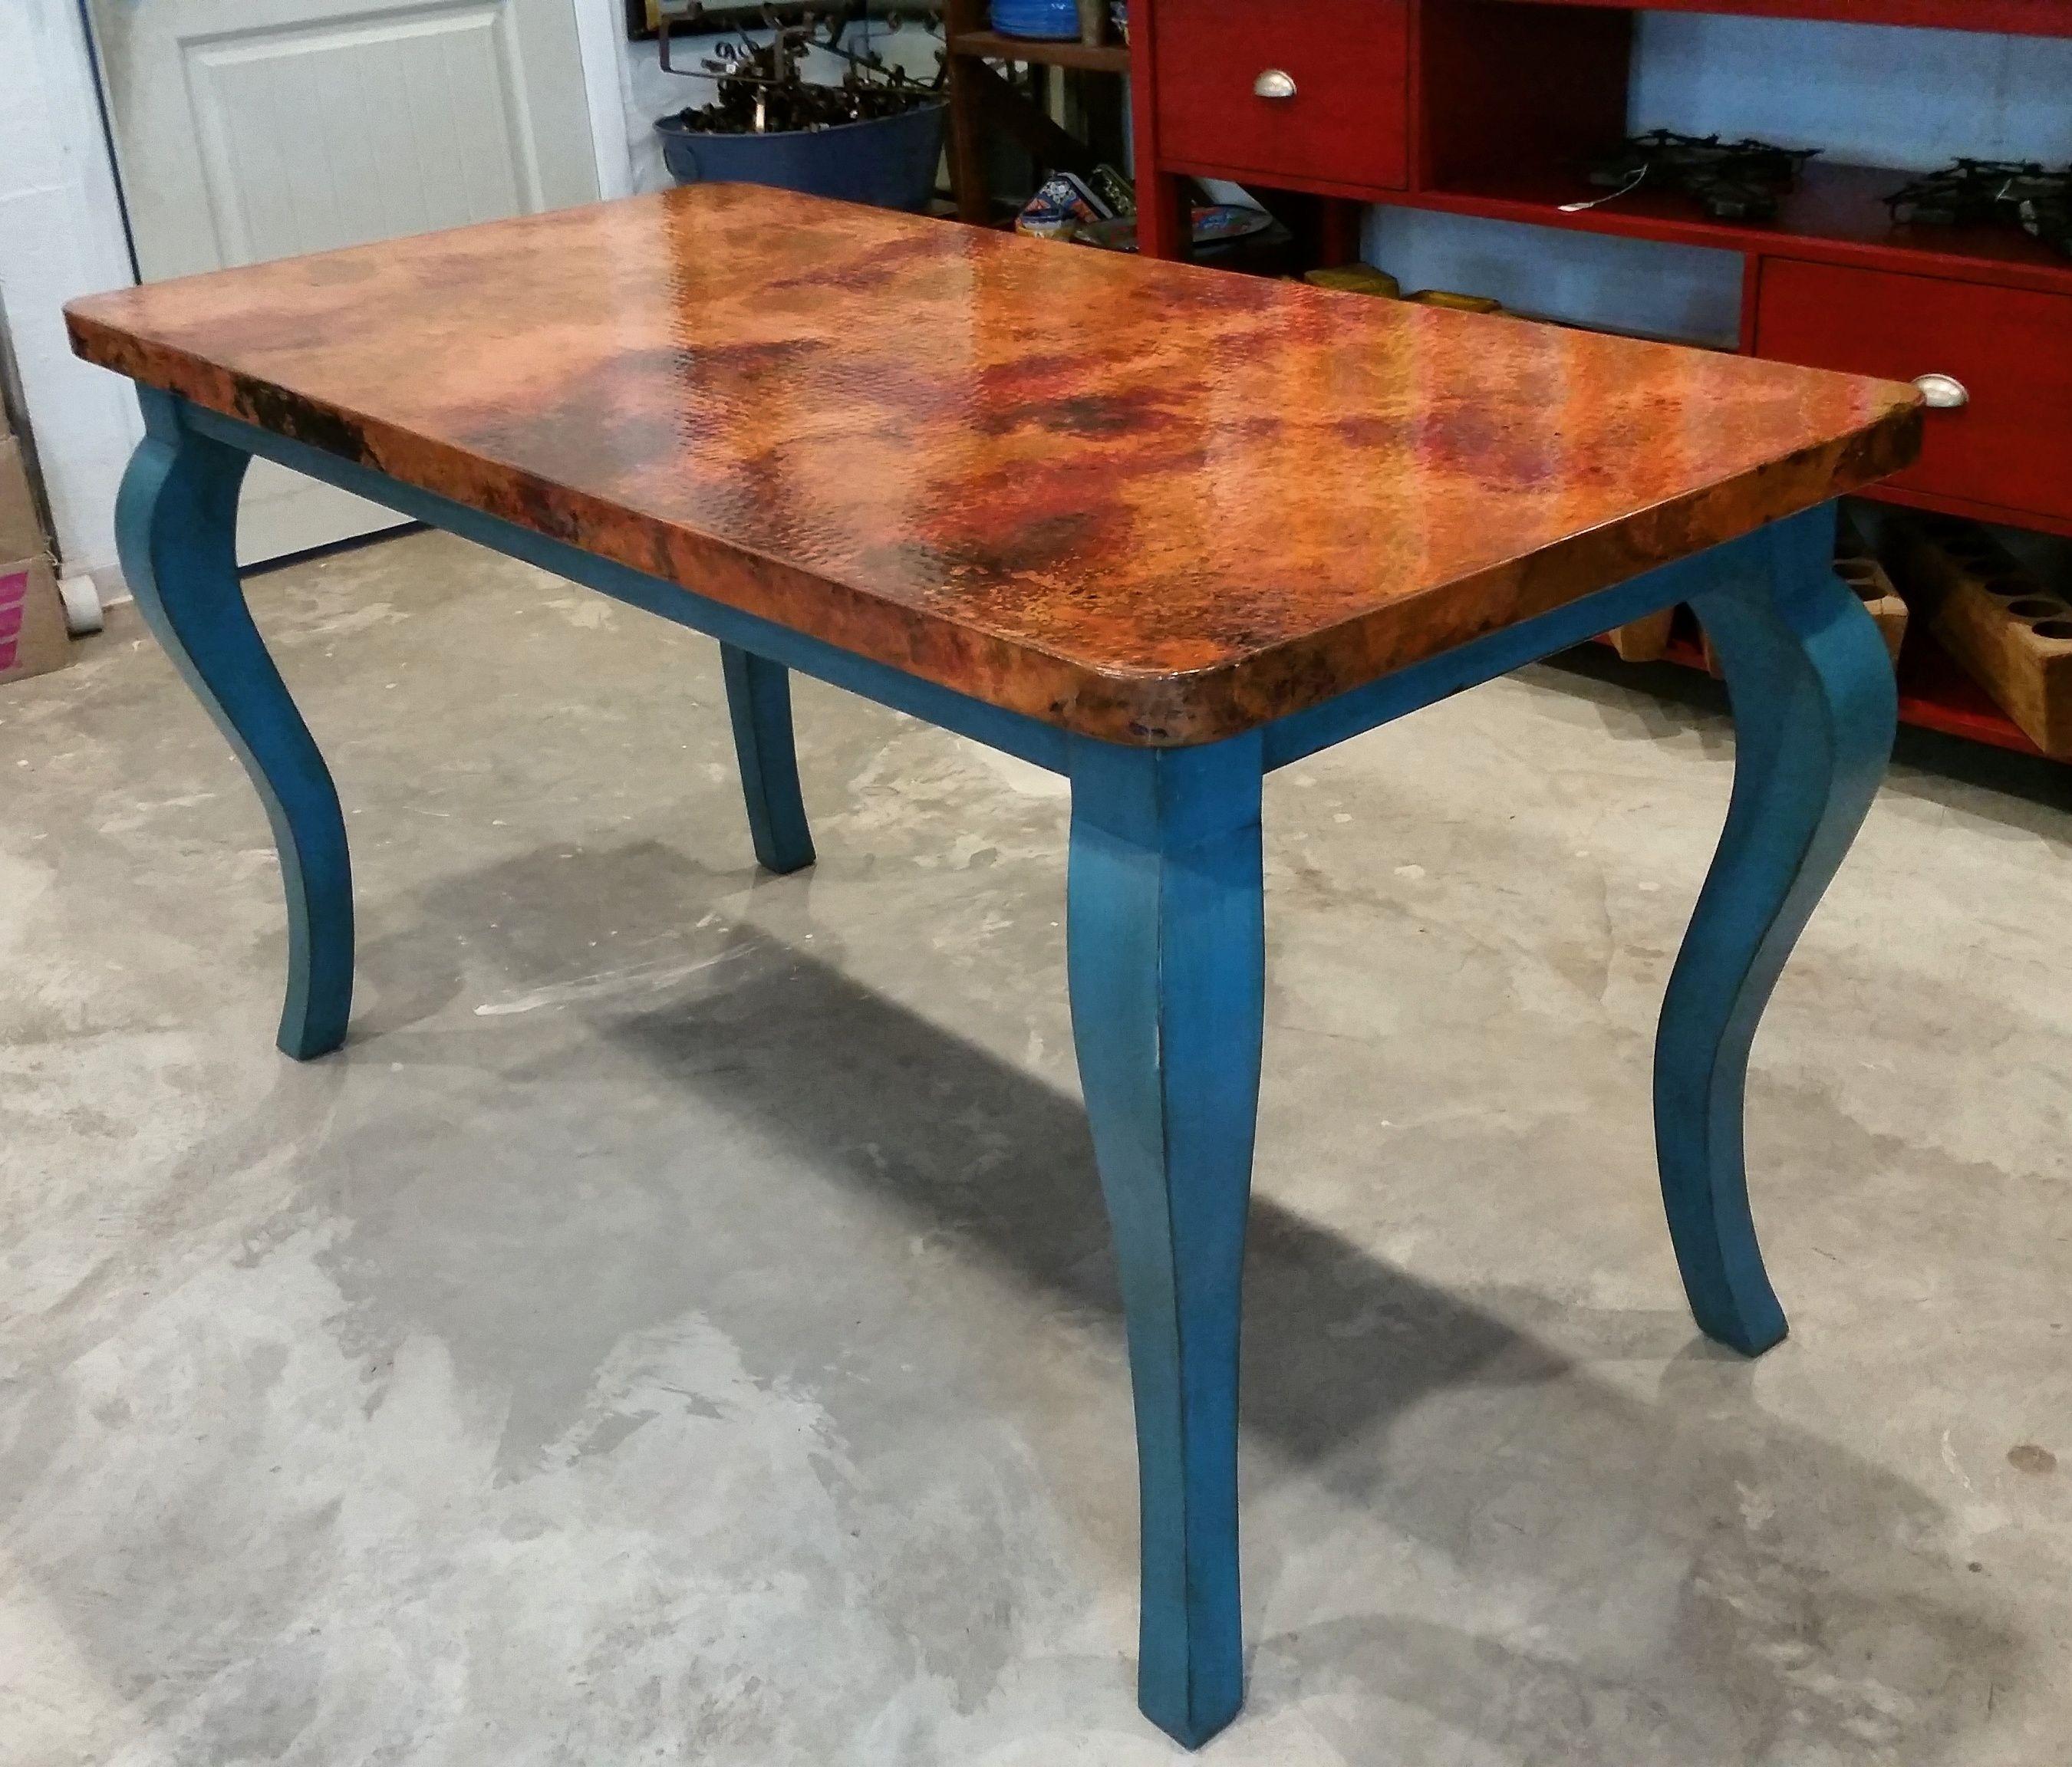 Custom Breakfast Copper Top Table De Barrio Antiguo In Houston